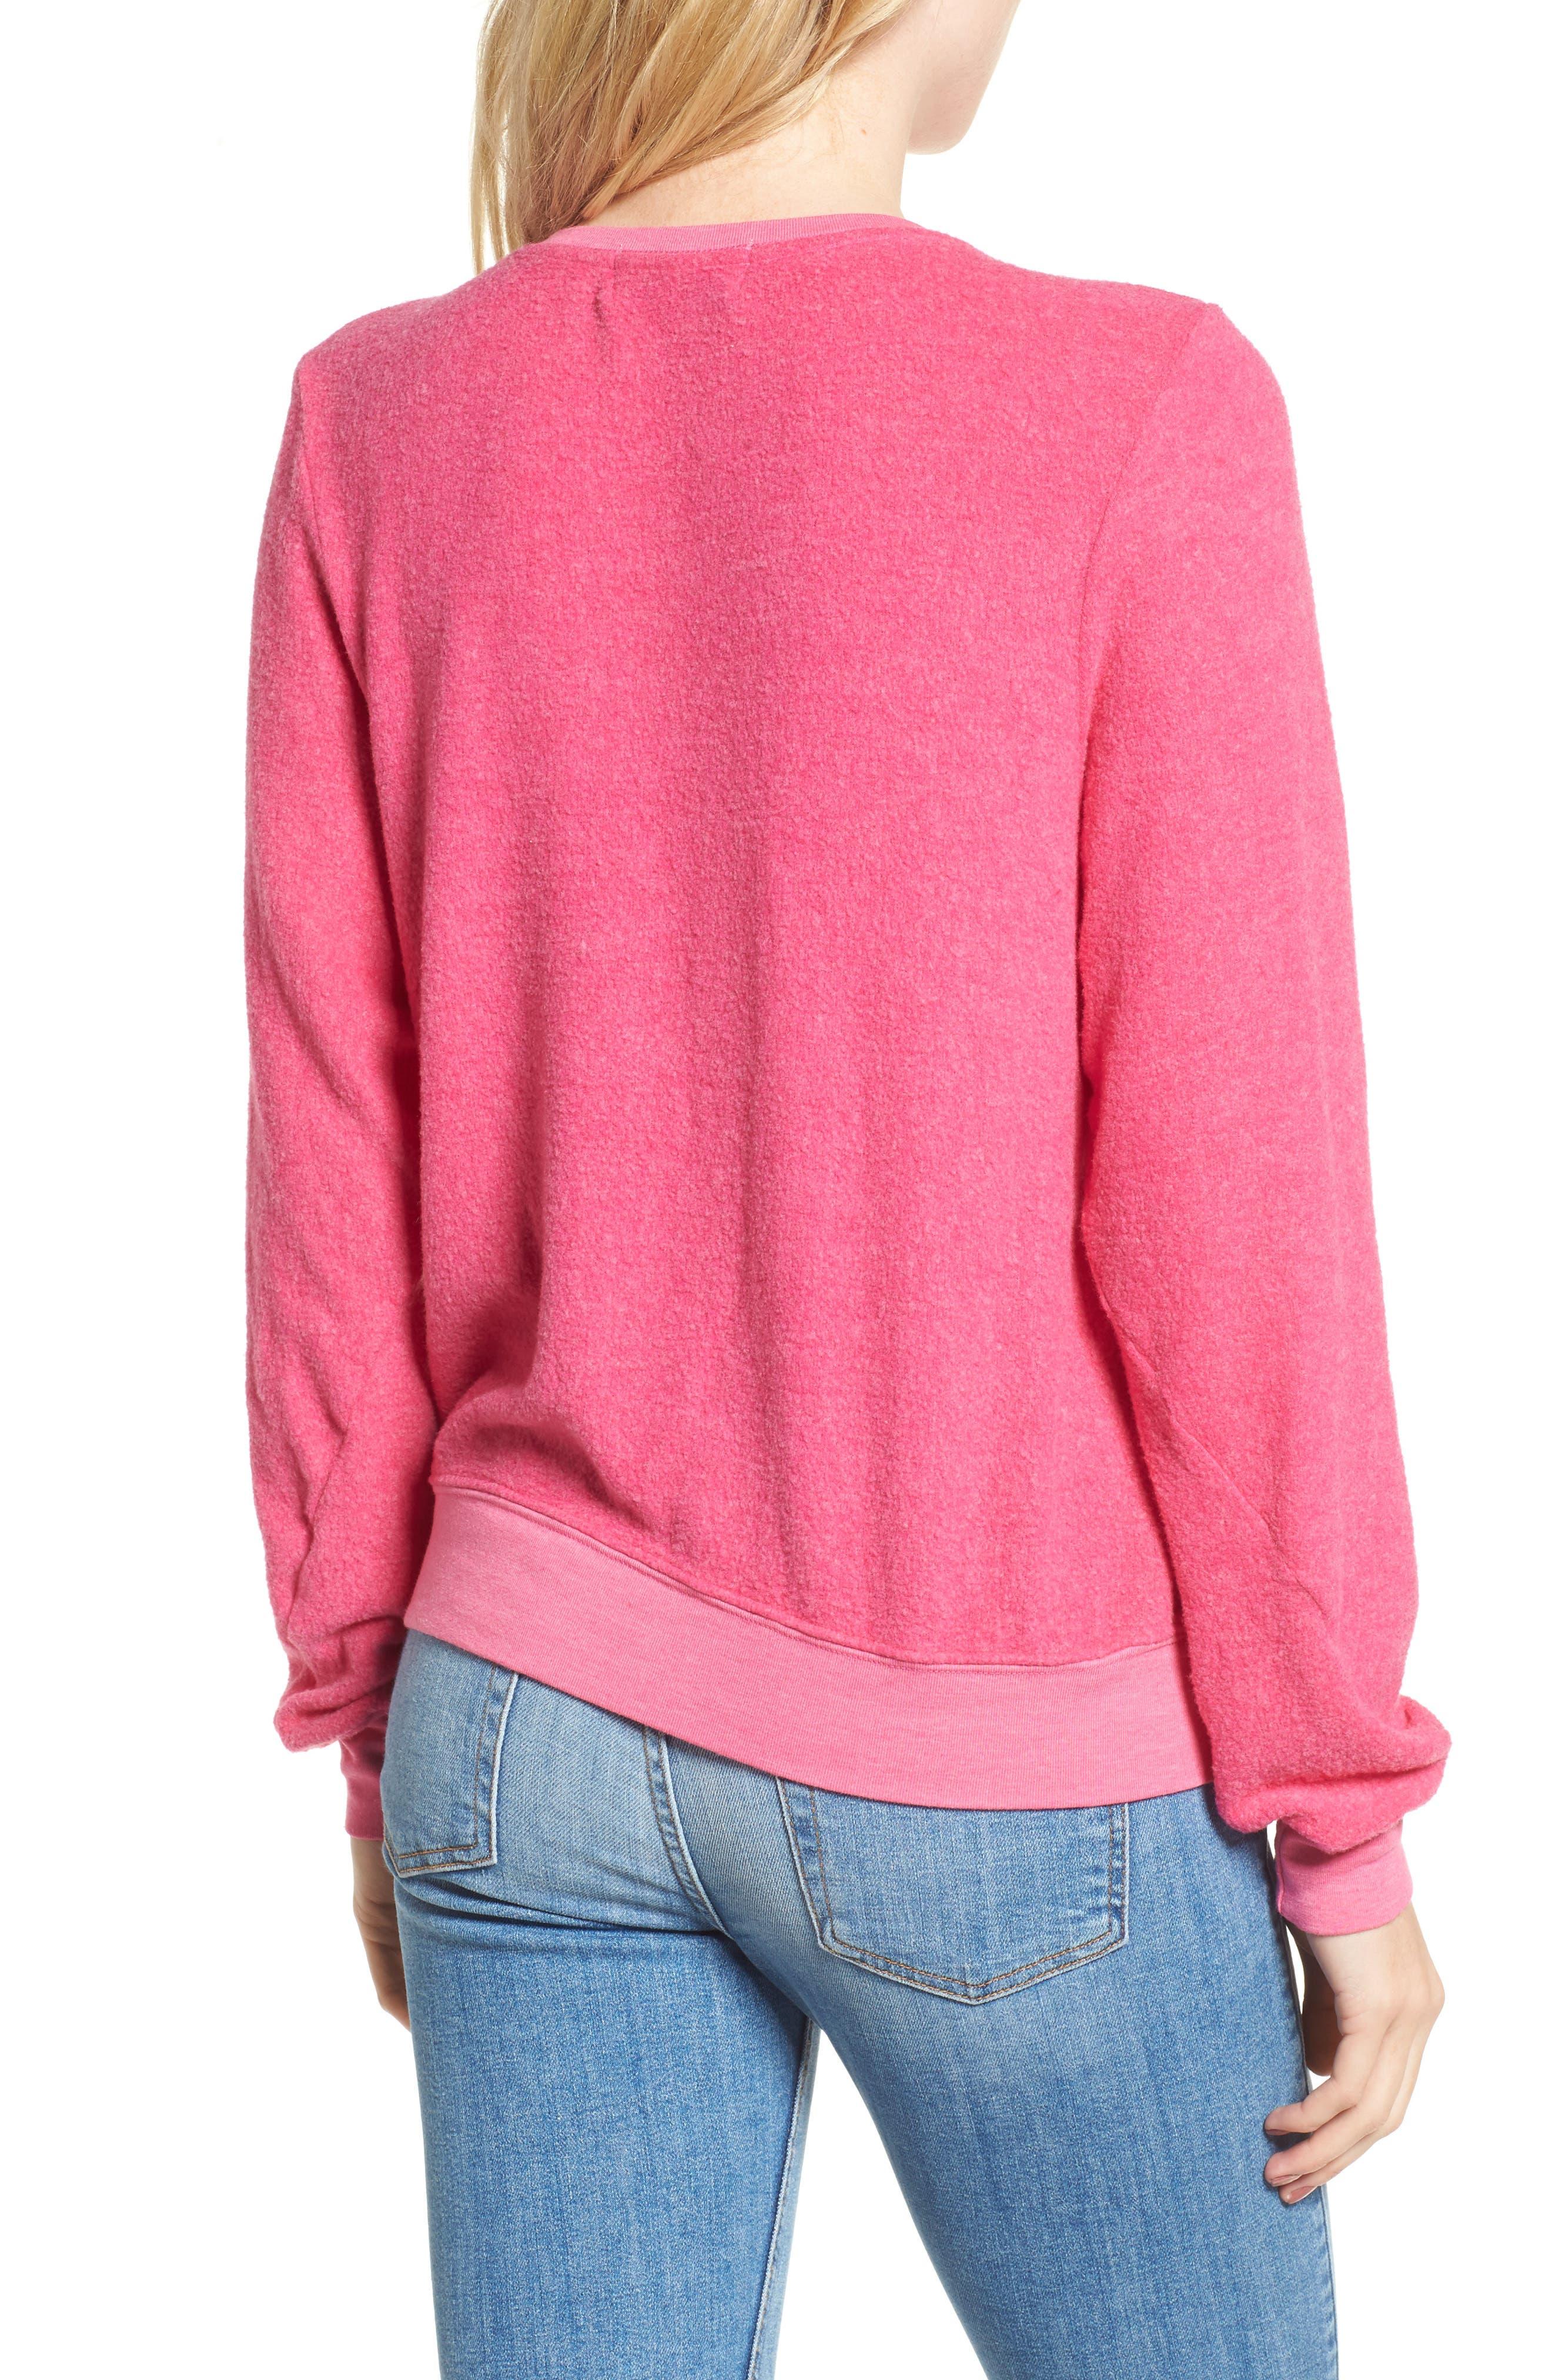 Jet Lagged Sweatshirt,                             Alternate thumbnail 2, color,                             Malibu Pink